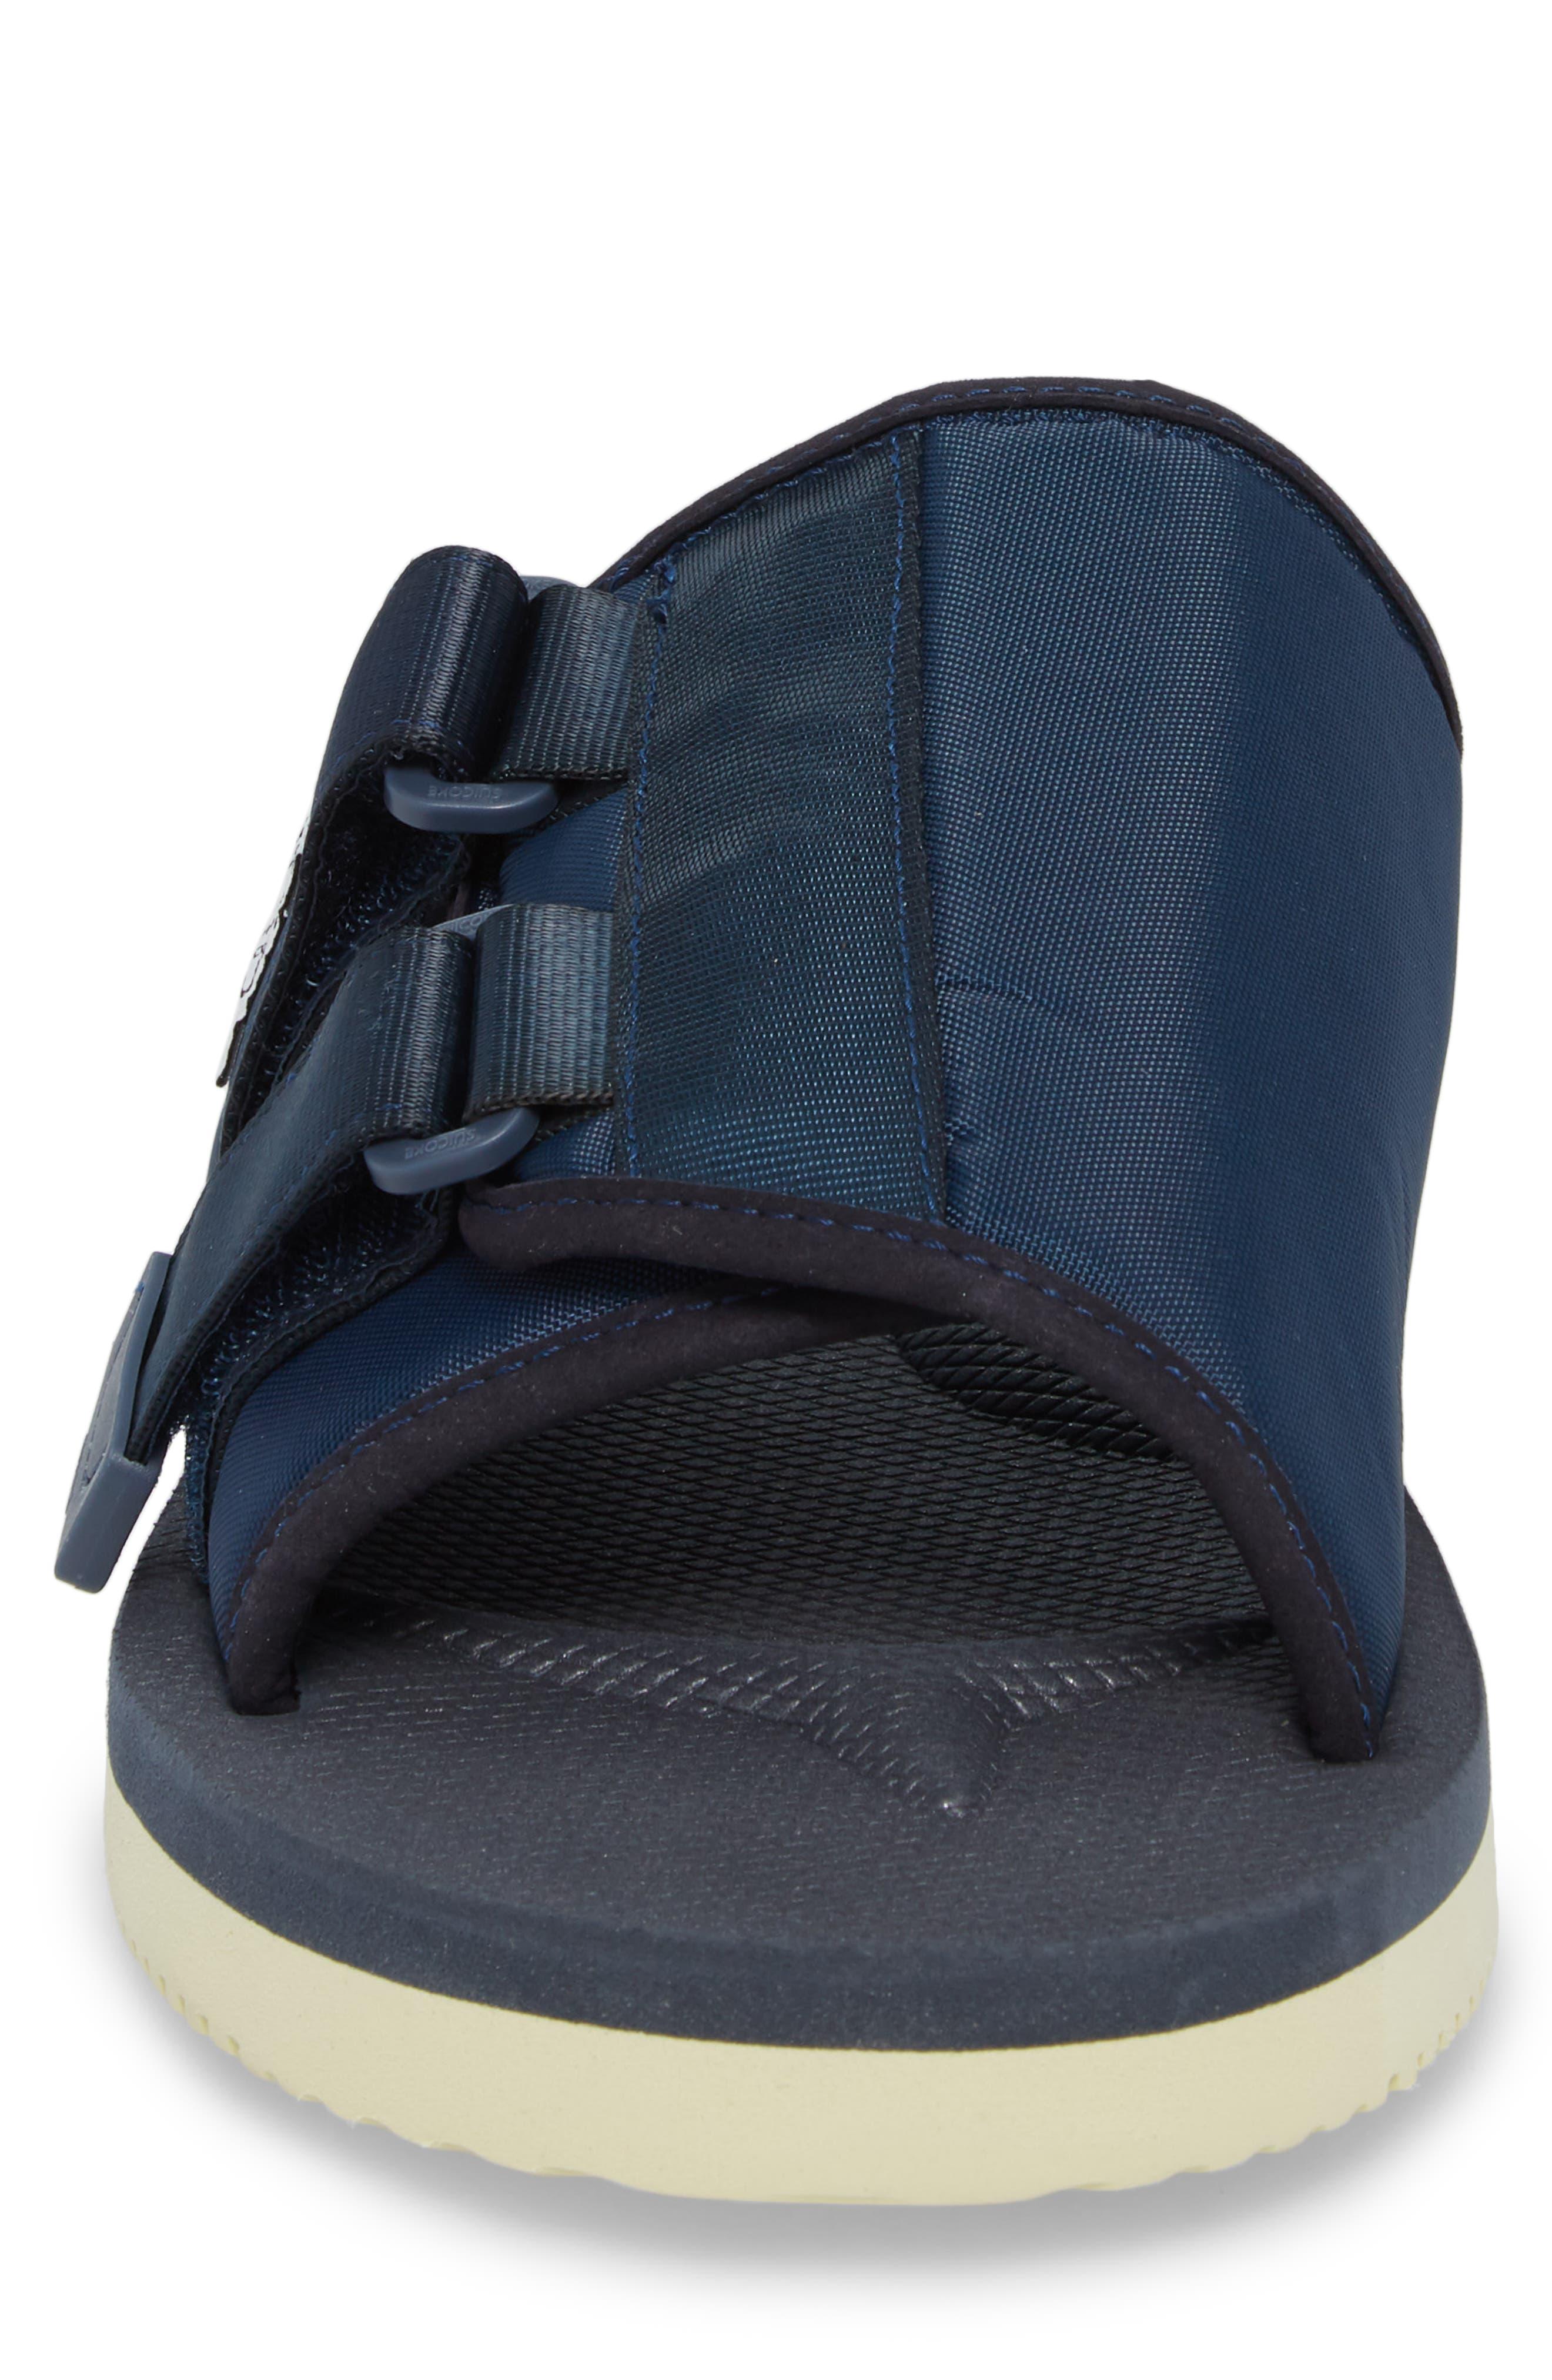 Kaw Cab Slide Sandal,                             Alternate thumbnail 4, color,                             Navy